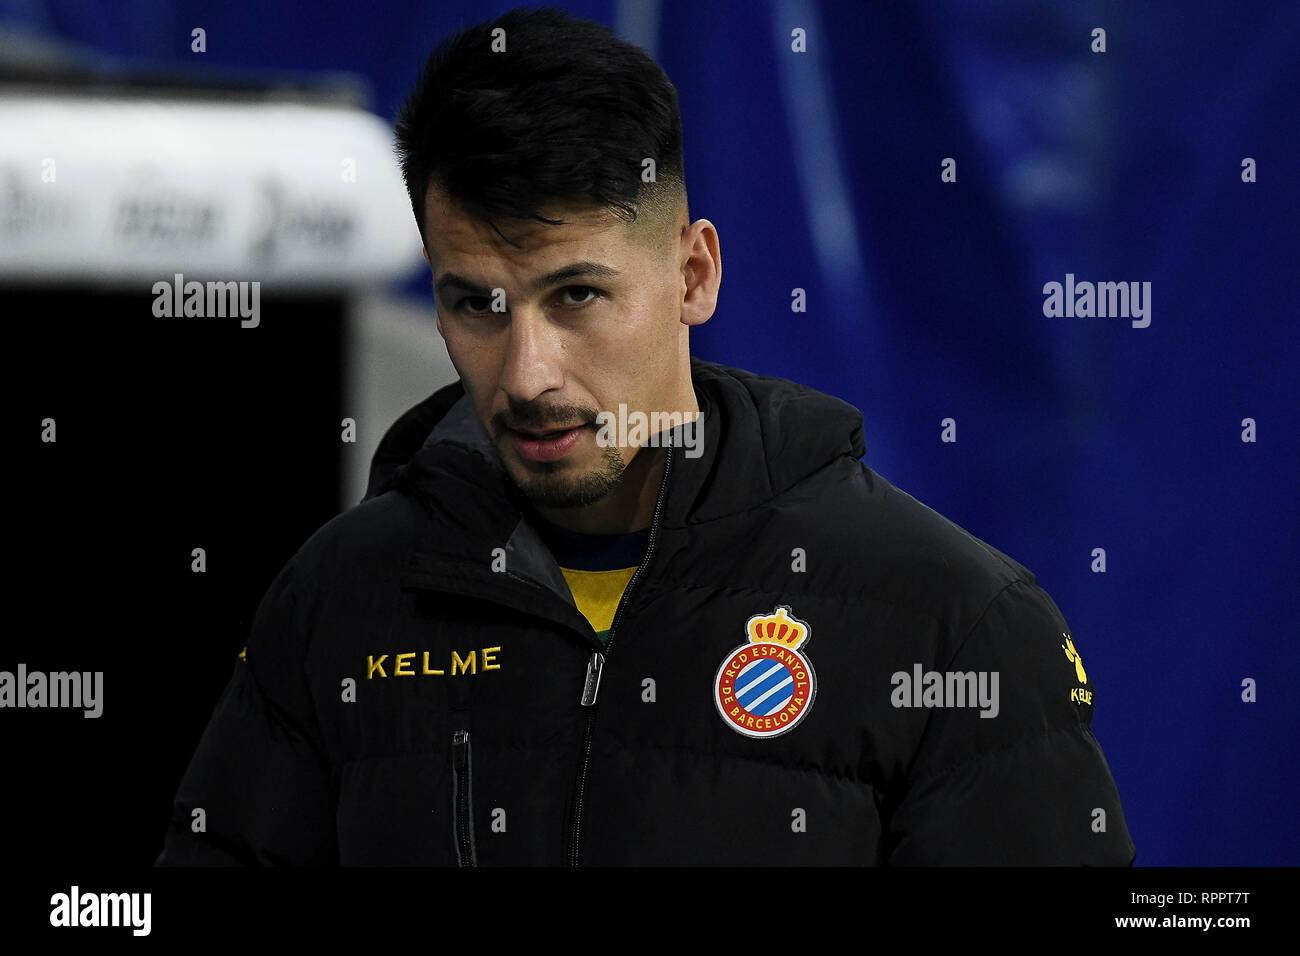 Hernan Perez of RCD Espanyol during the match between RCD Espanyol vs SD Huesca of La Liga, date 25, 2018-2019 season. RCDE Stadium. Barcelona, Spain - 22 FEB 2019. - Stock Image